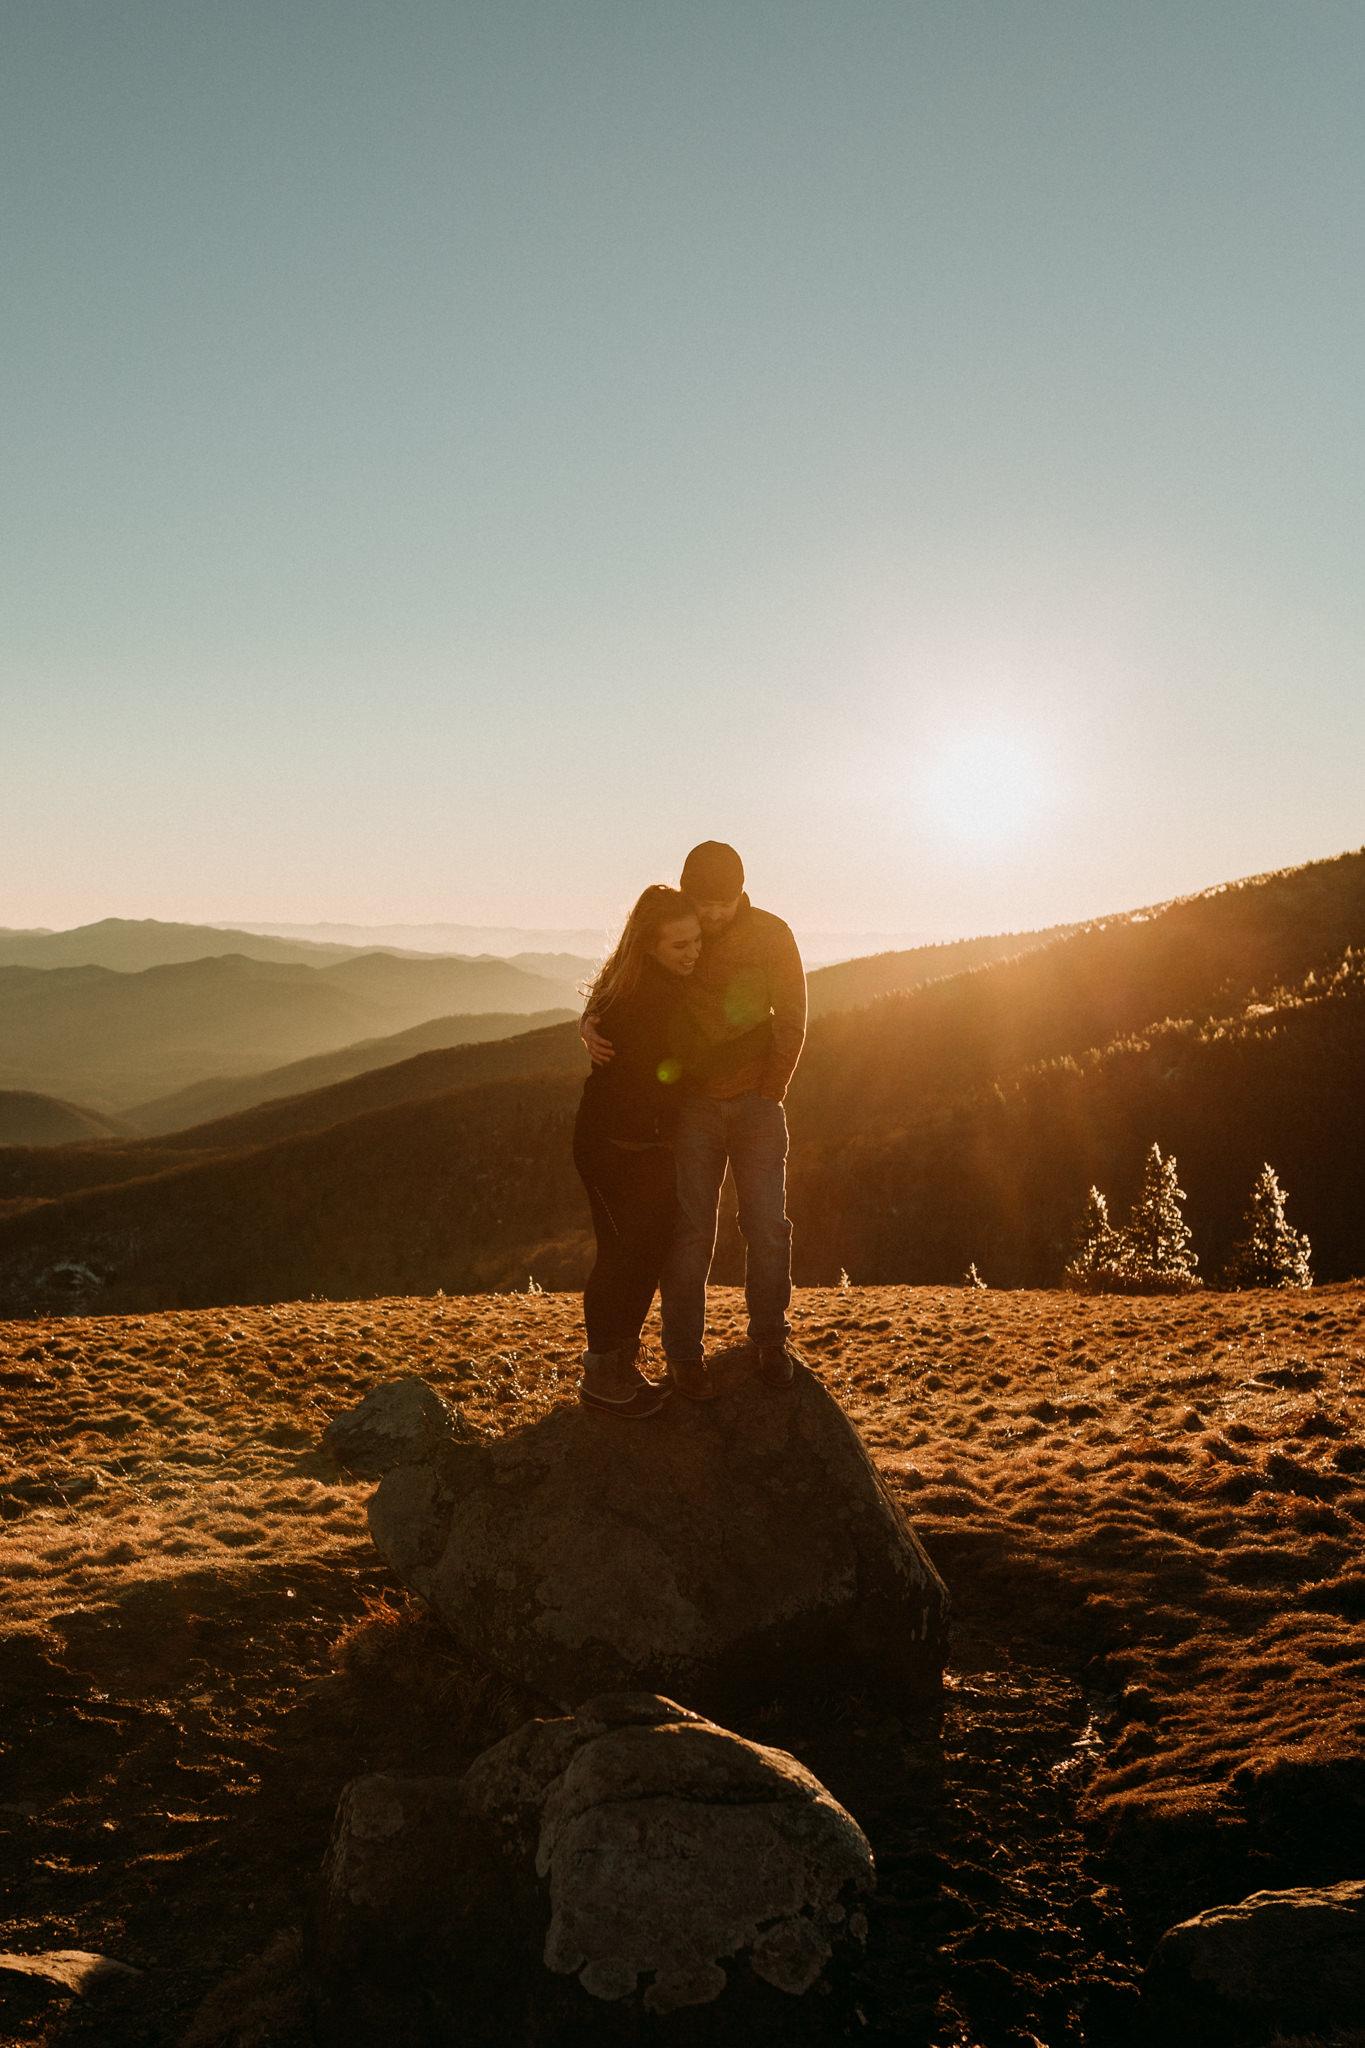 MonicaLeavellPhoto-AshleyMitch-NorthCarolina-Adventure-Engagement-Photographer-34.jpg